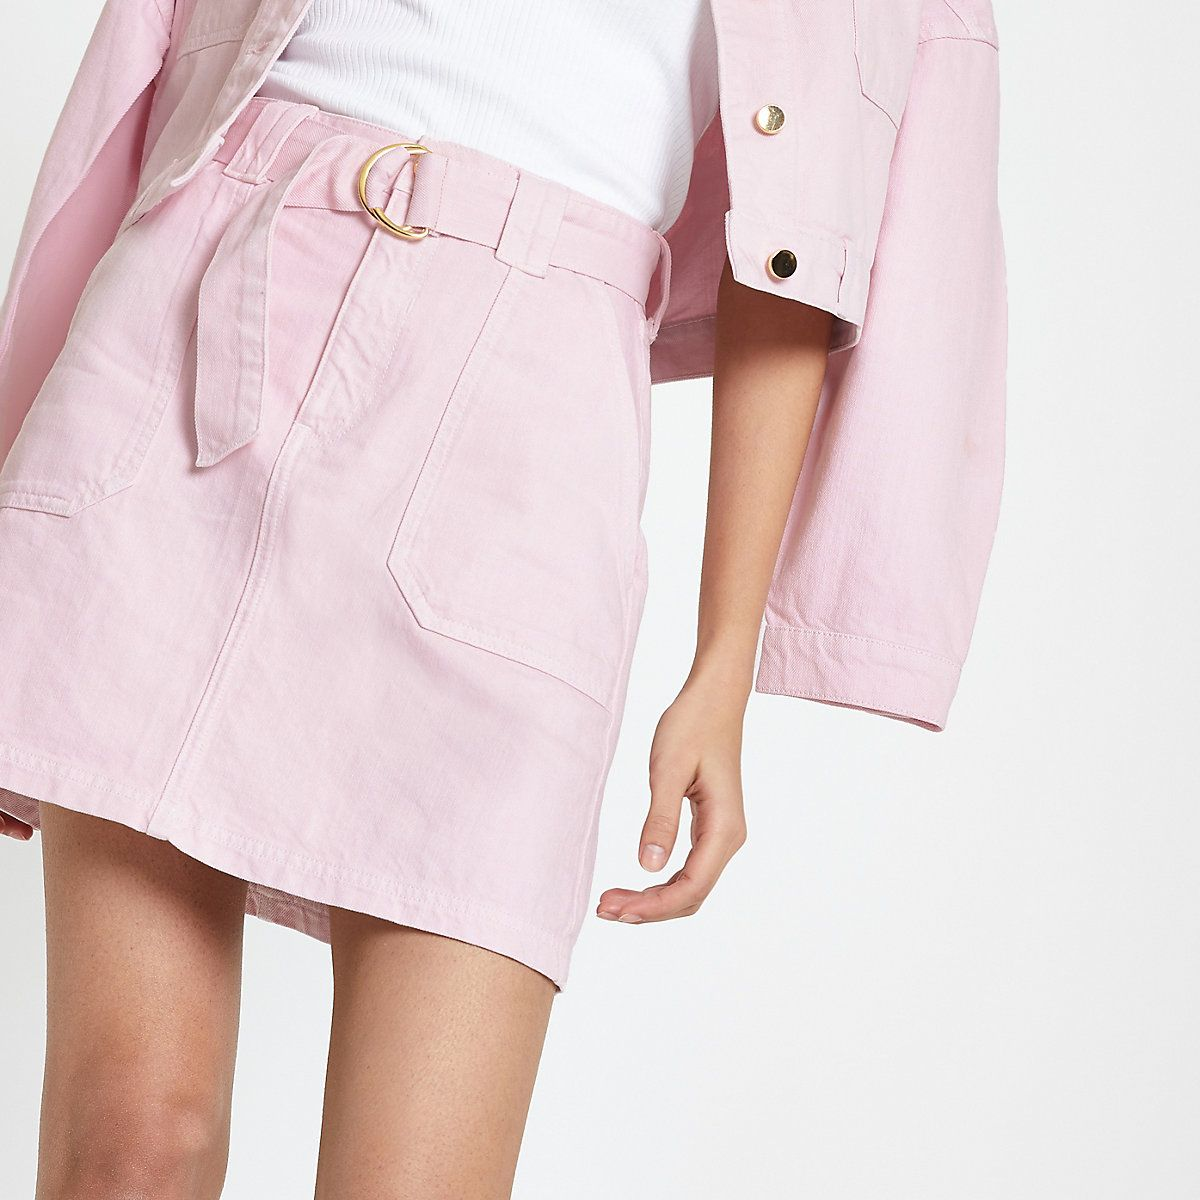 8616b55b87a6 Pink utility denim skirt - Mini Skirts - Skirts - women